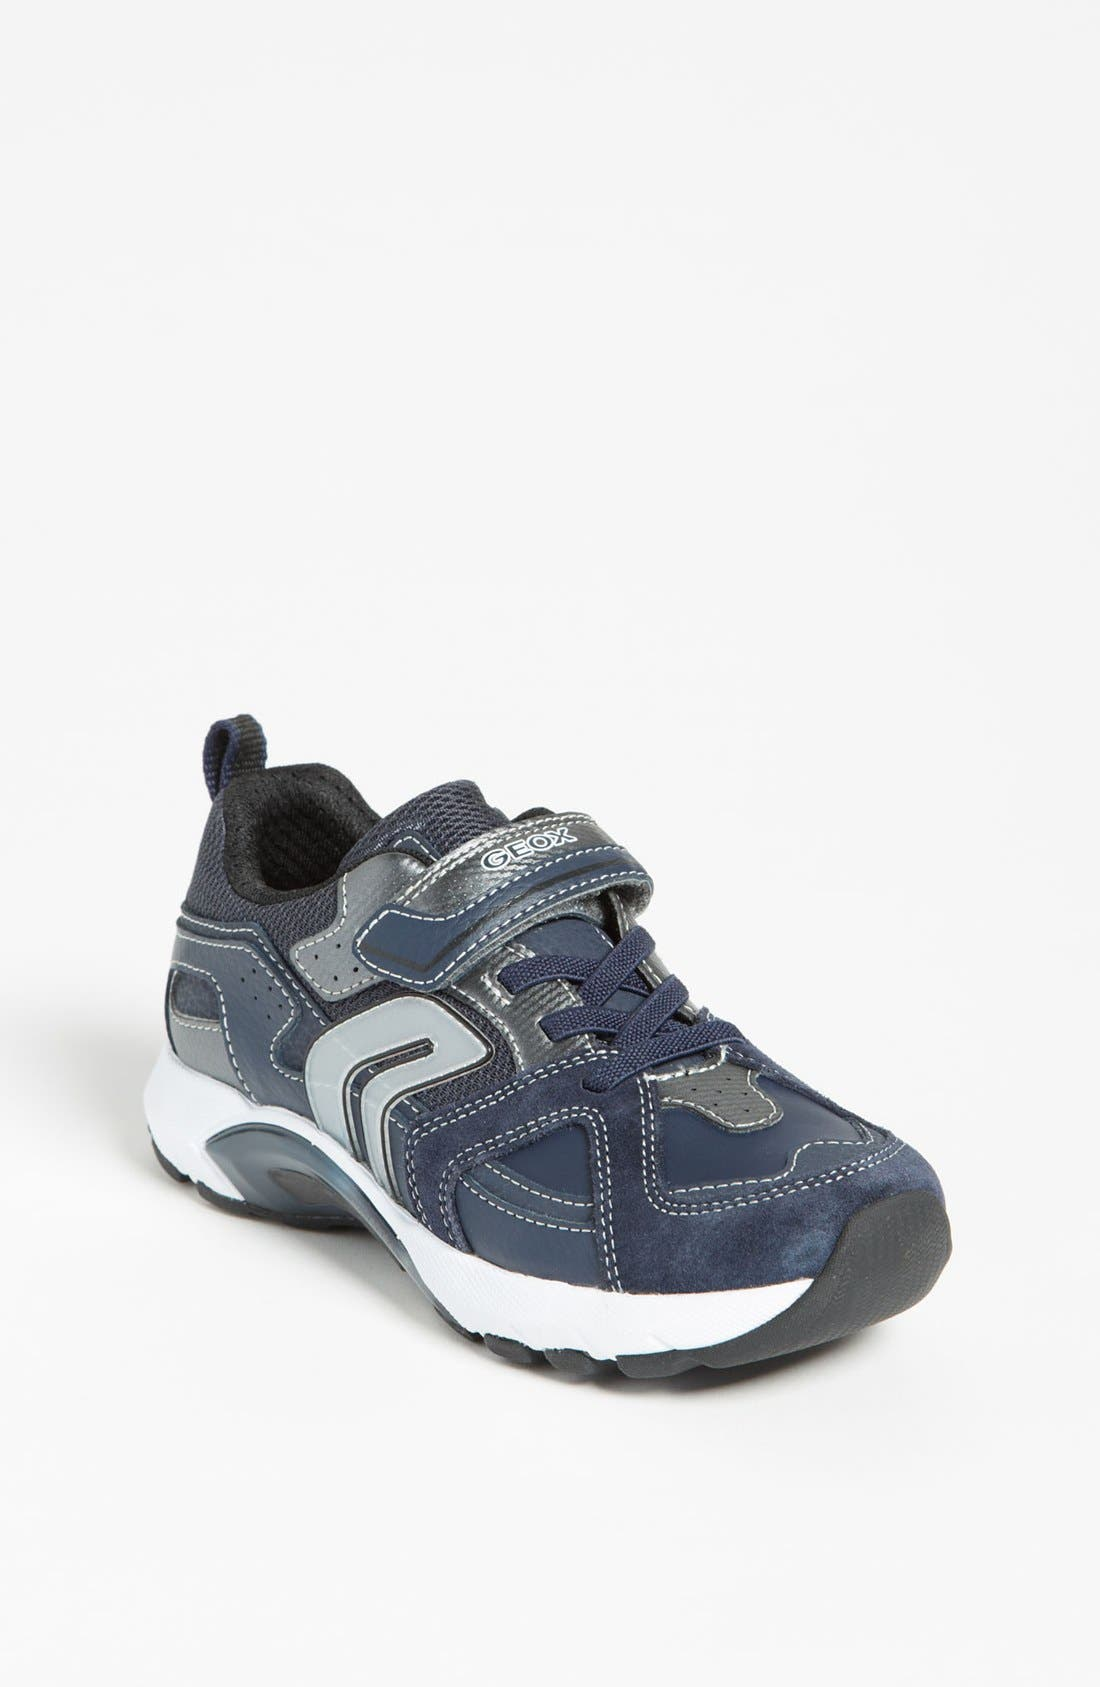 Main Image - Geox 'Stark 8' Sneaker (Toddler, Little Kid & Big Kid)